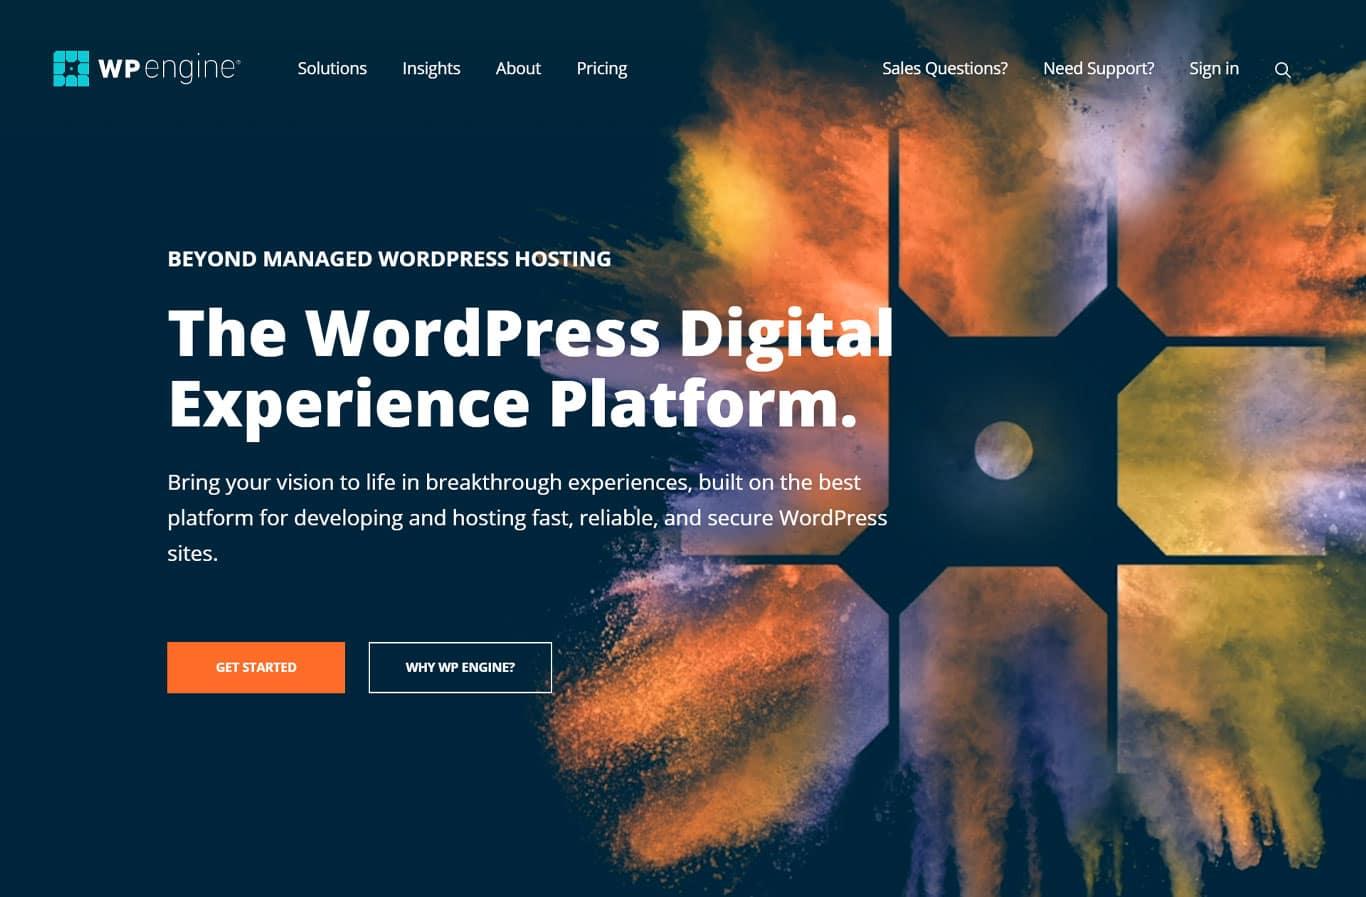 WPEngine site image